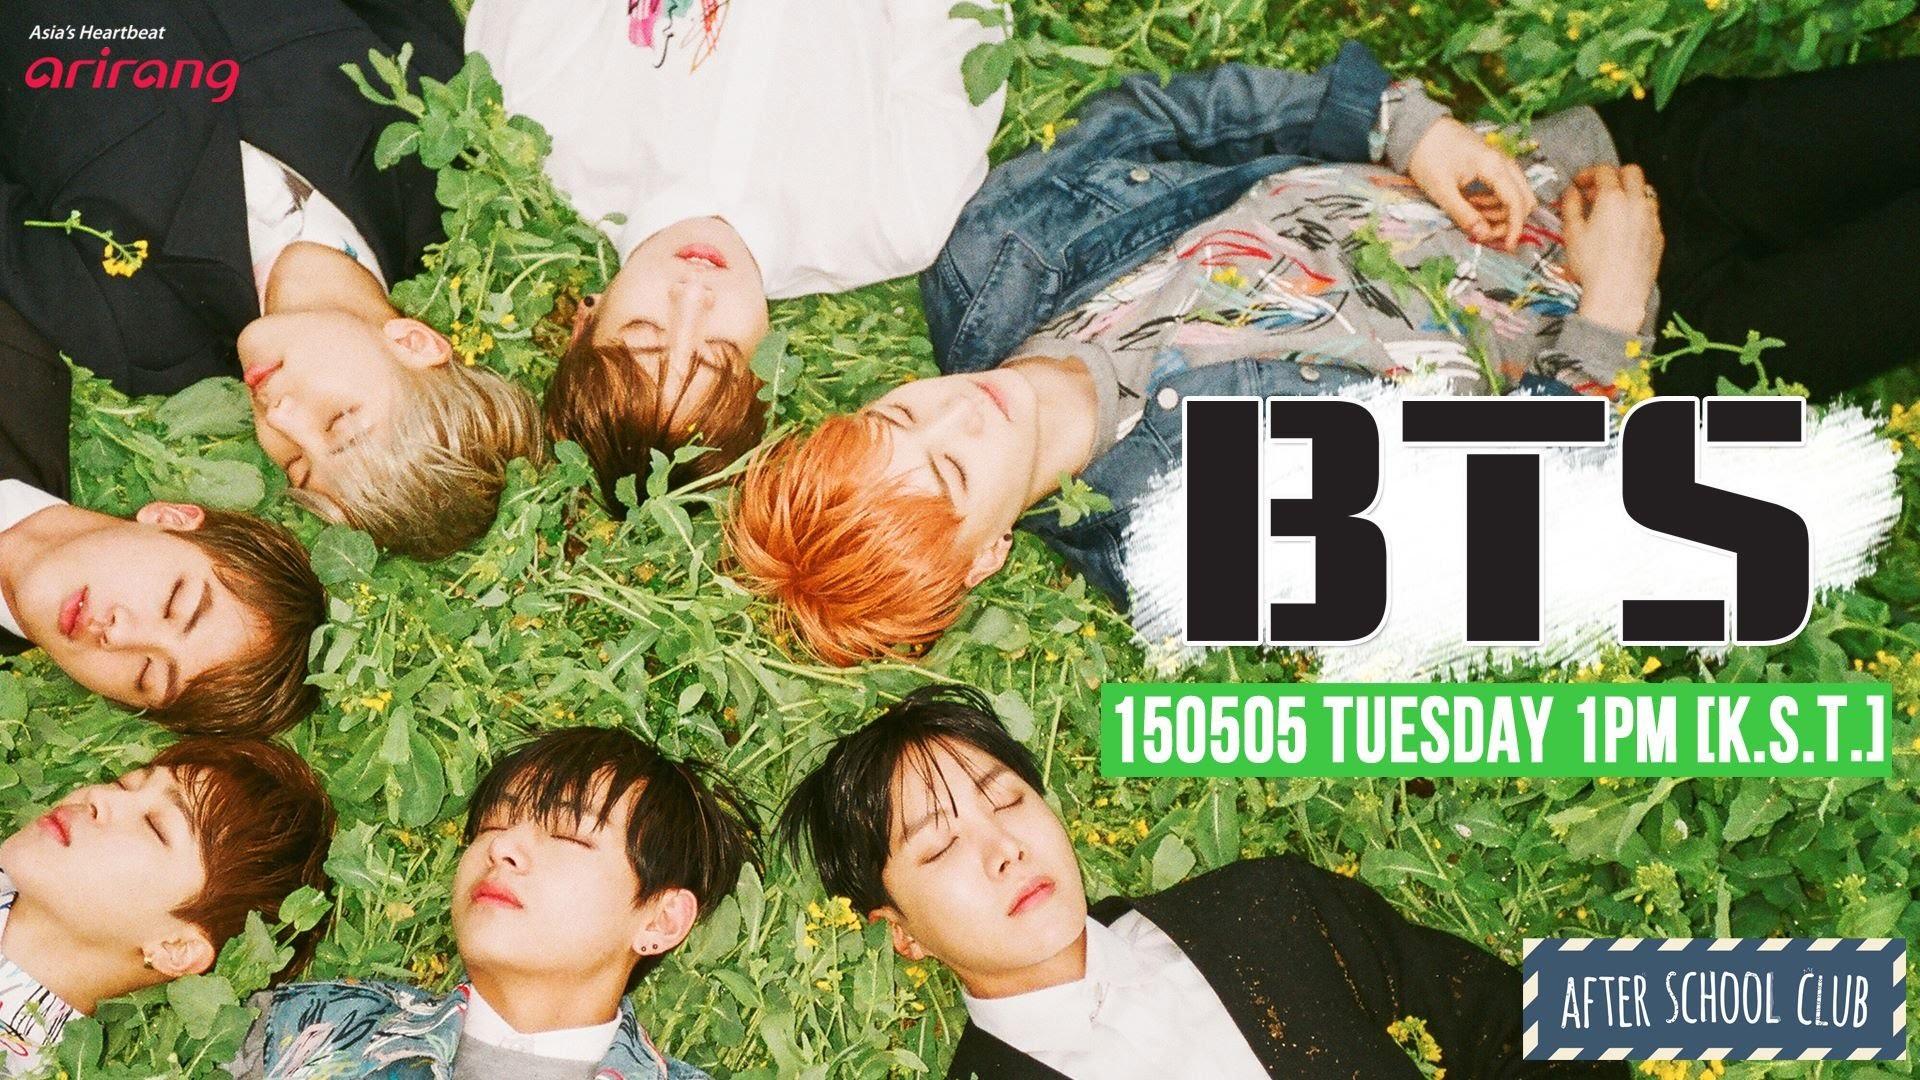 After School Club – Bangtan Boys(방탄소년단) BTS – Full Episode – YouTube